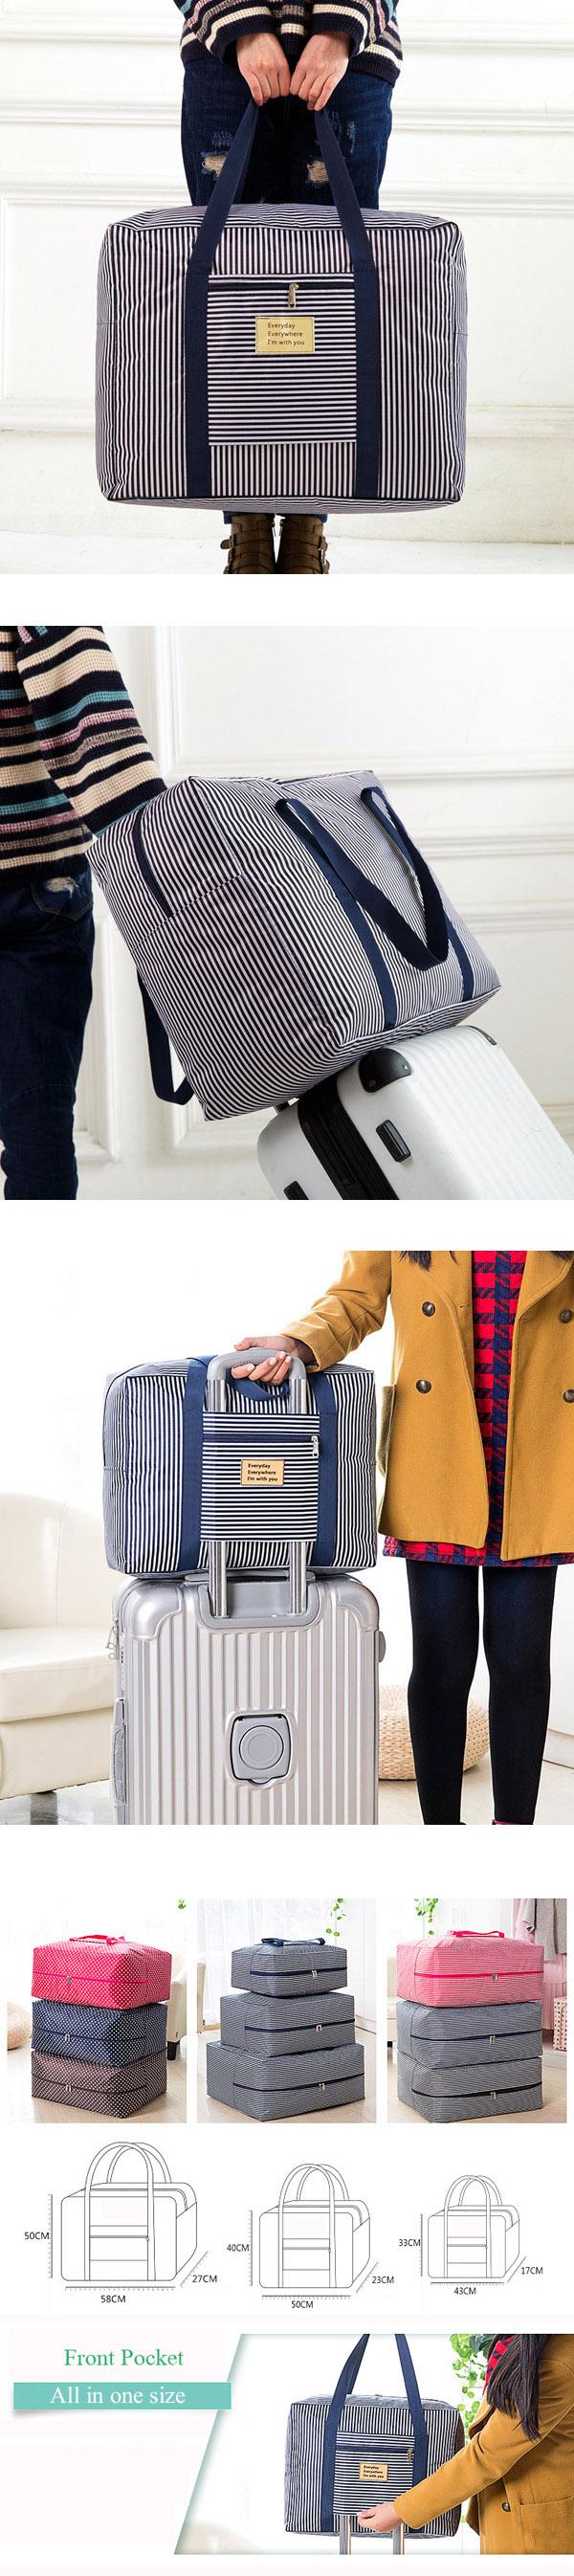 Women Men Oxford Cloth Waterproof Travel Stroage Bag Luggage Bag